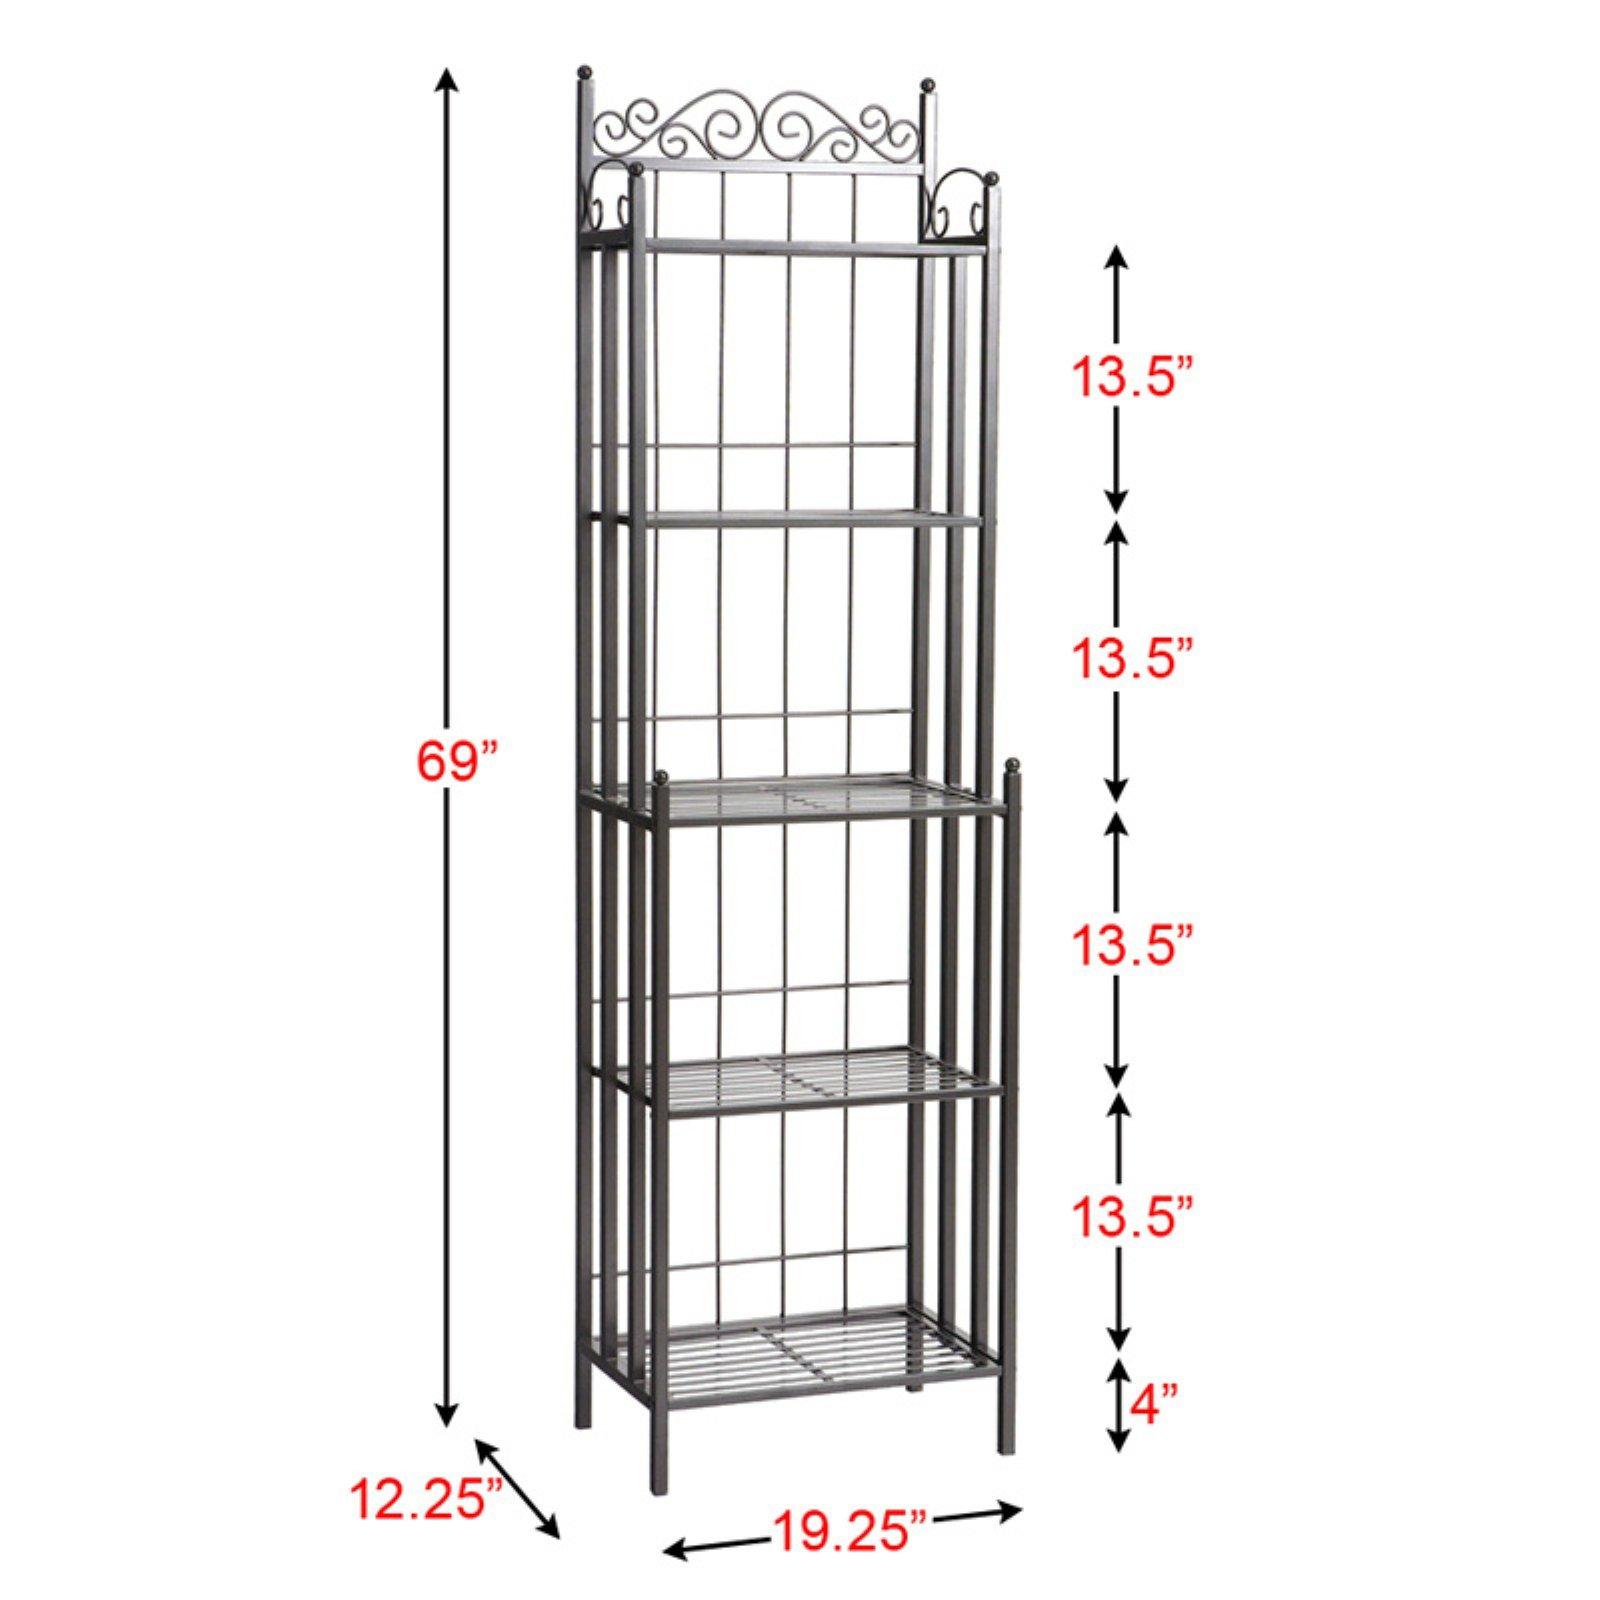 Versatile Vertical Victorian Style 5 Tier Standing Narrow Baker Rack, Planter Stand Storage Shelf for Indoor with Iron Frame, Balcony Shelving Unit, Rustproof Organizer for Corner, Plant Shelves by Nova Natural (Image #7)